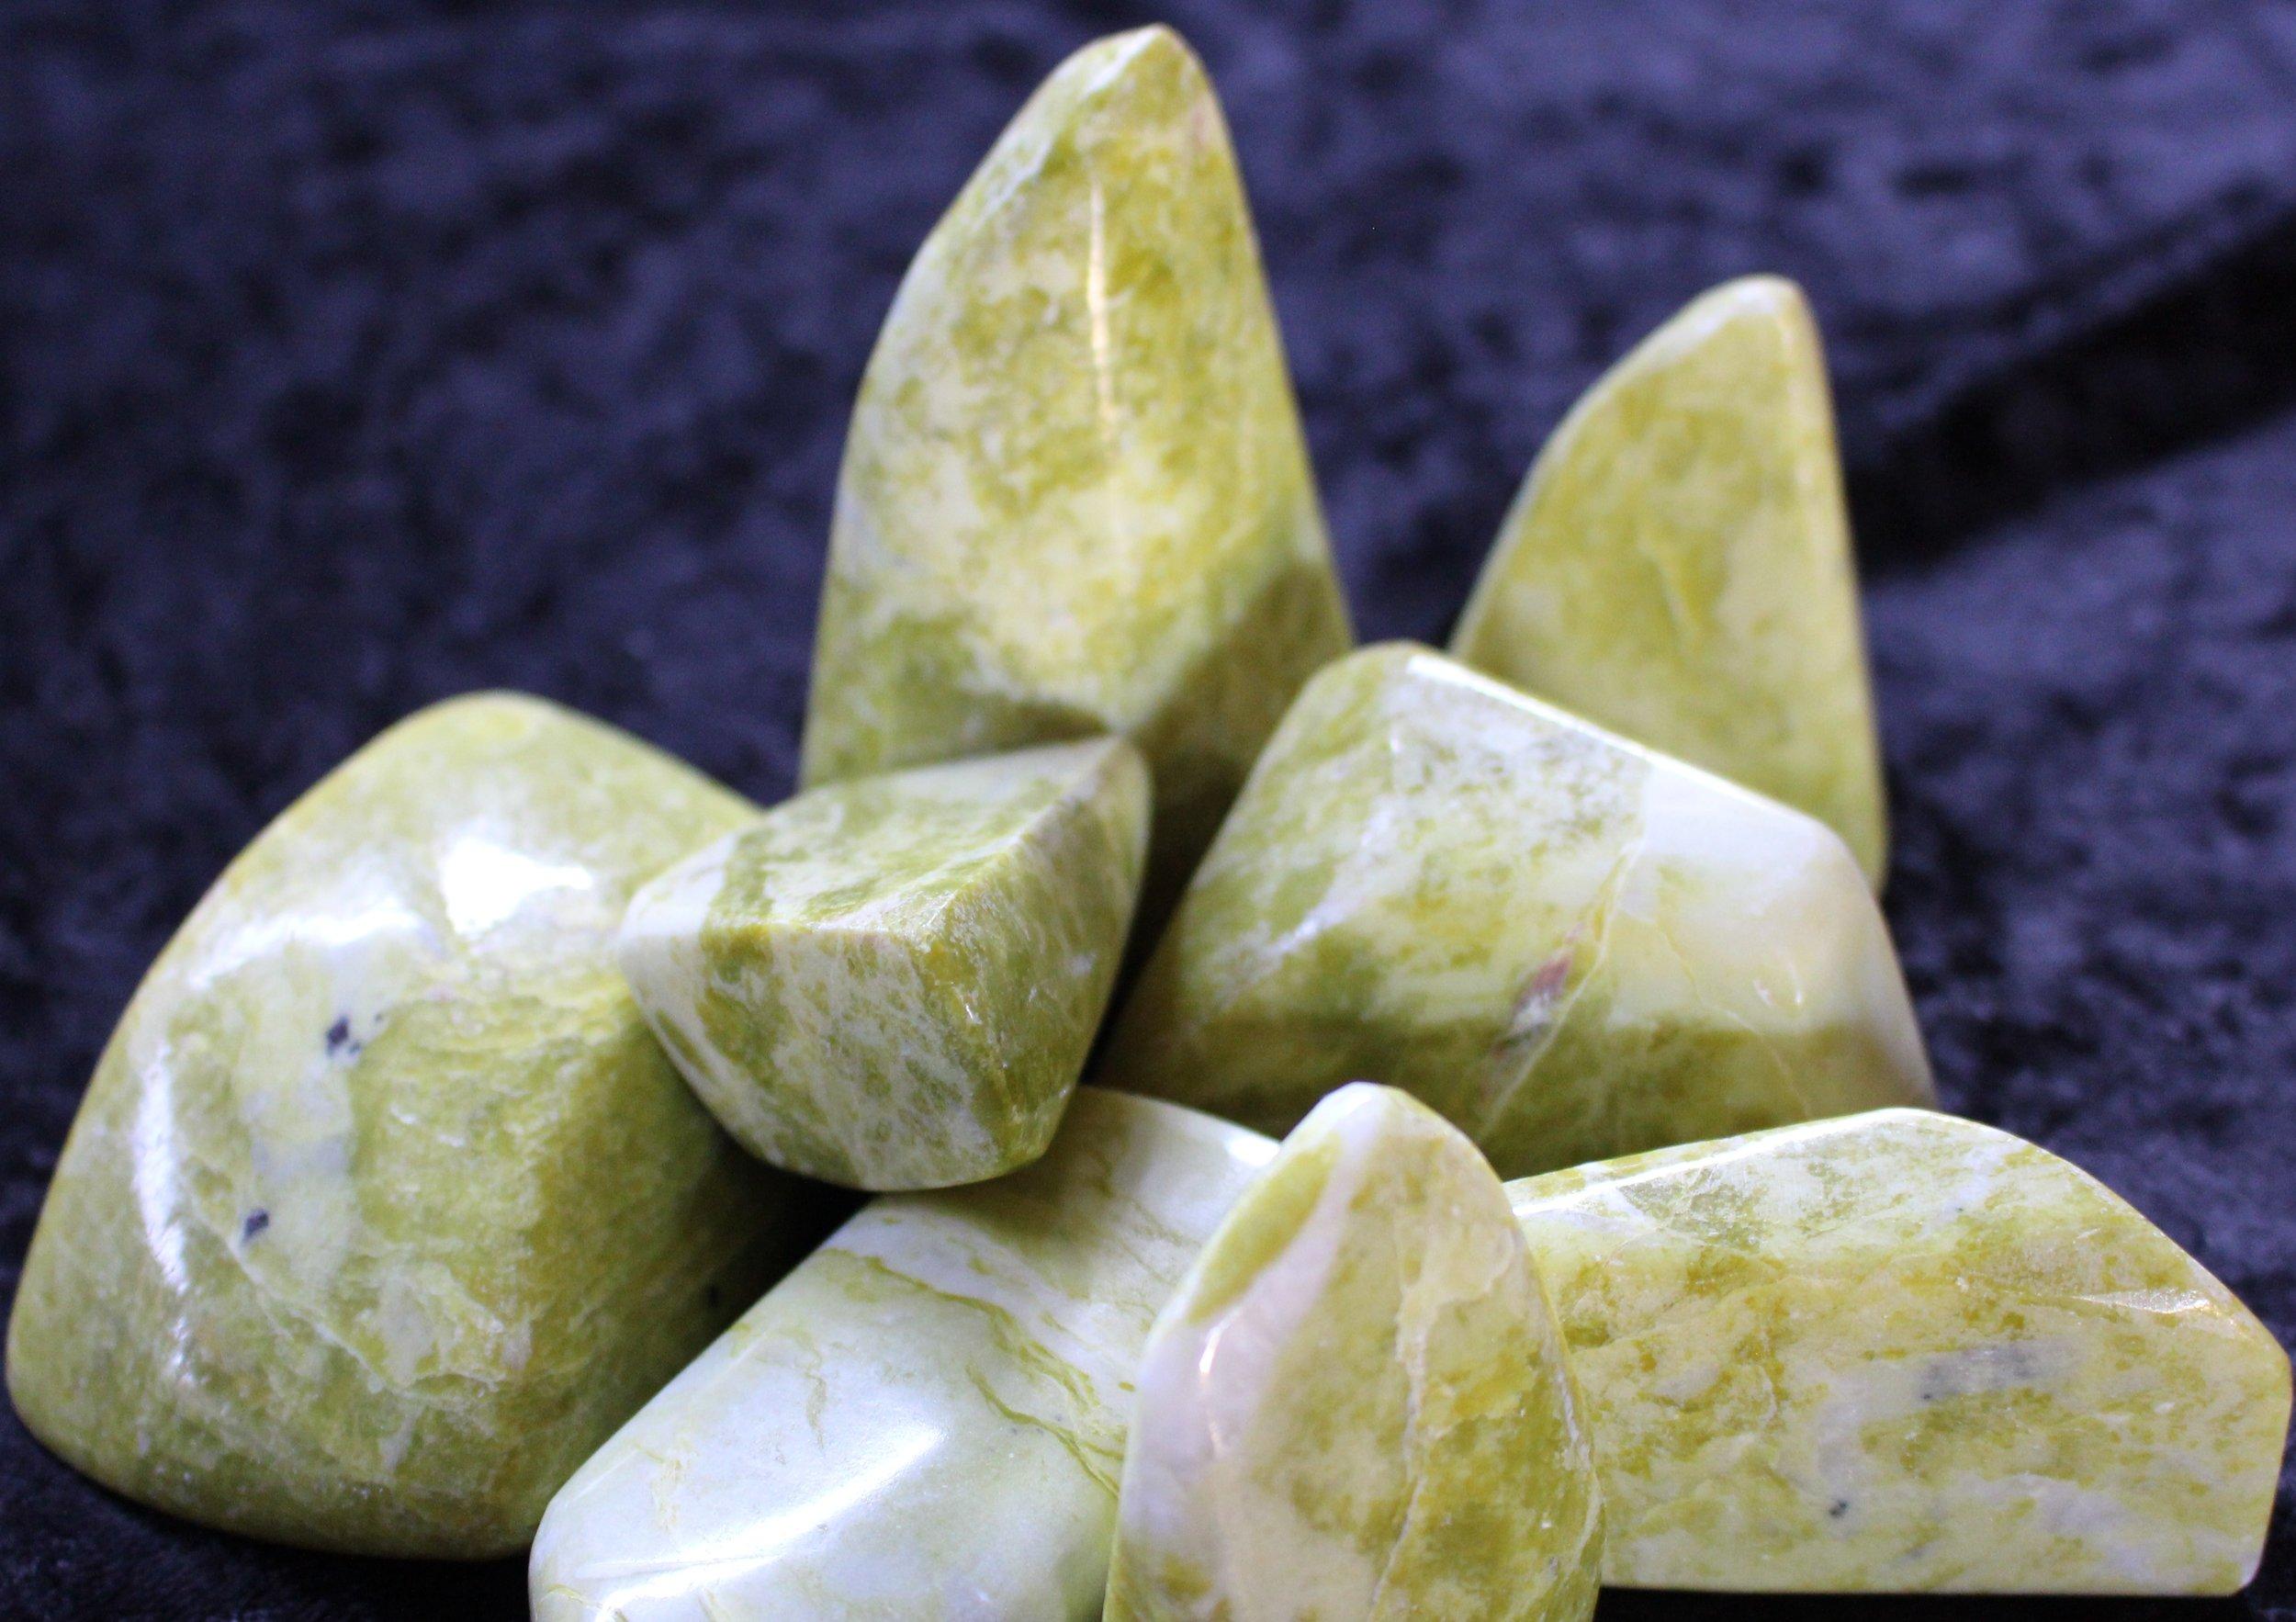 Lemon Serpentine Stones